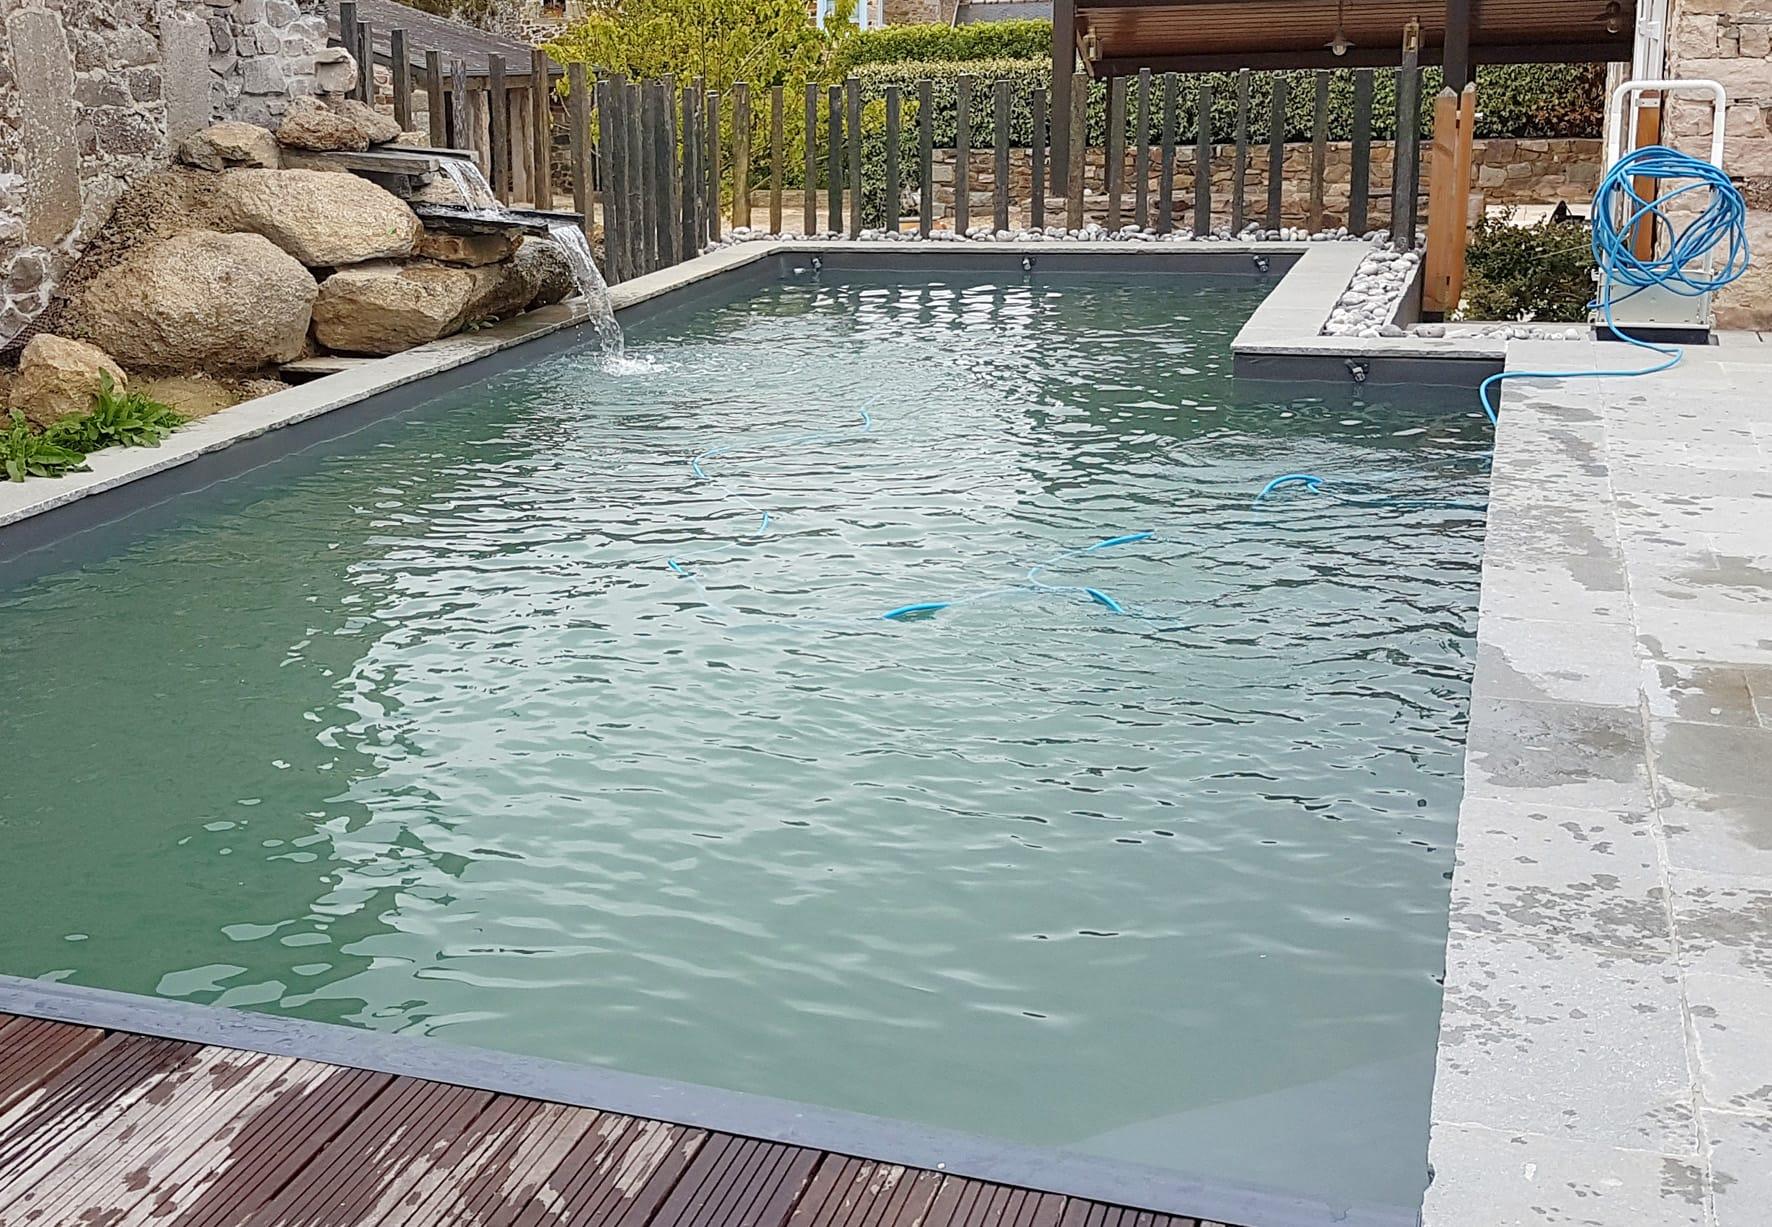 Bulles sensations piscine spa sauna hammam for Piscine hammam sauna